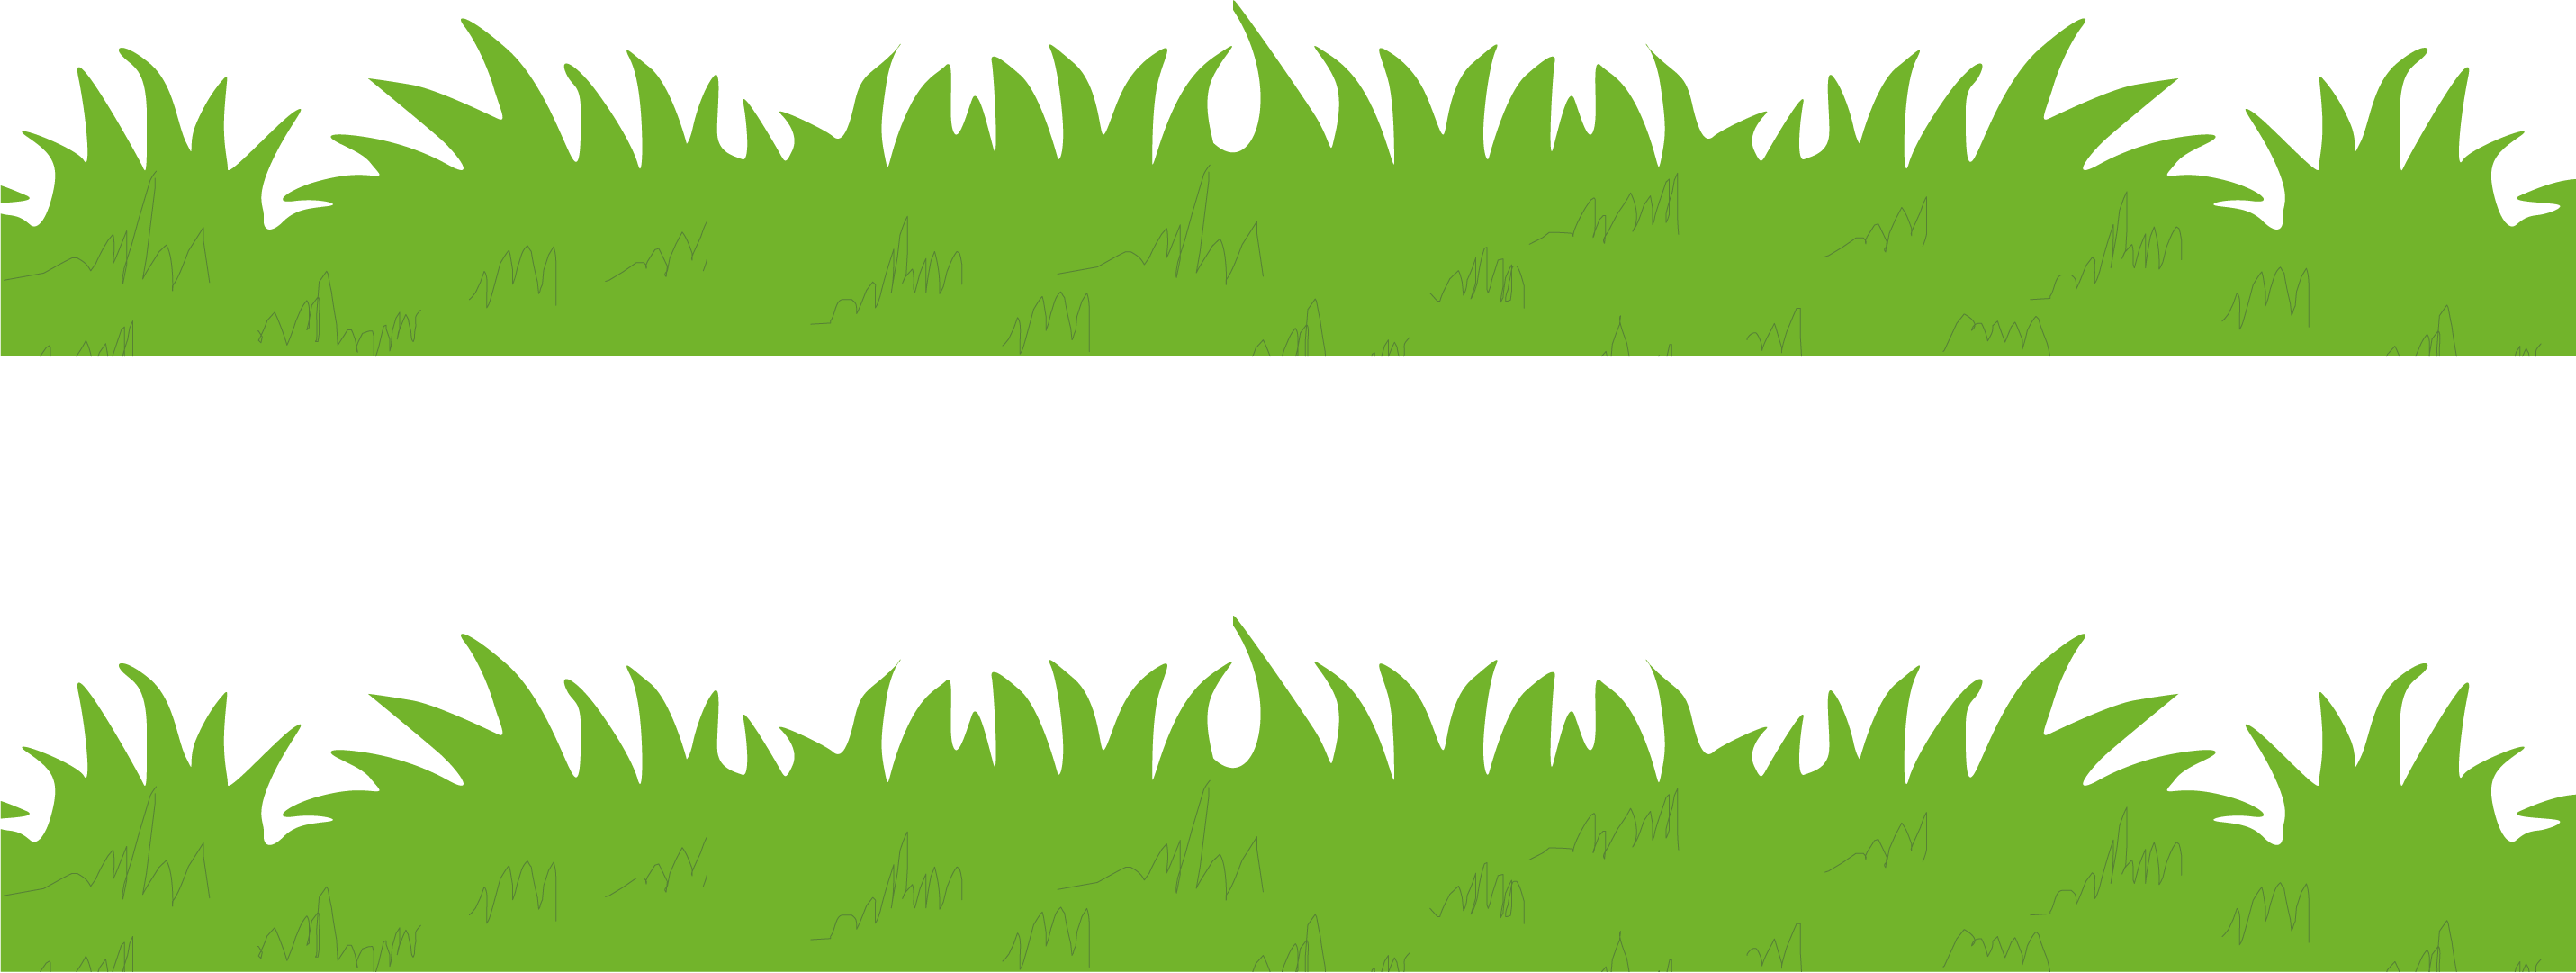 Clipart grass illustration. Gis clip art png